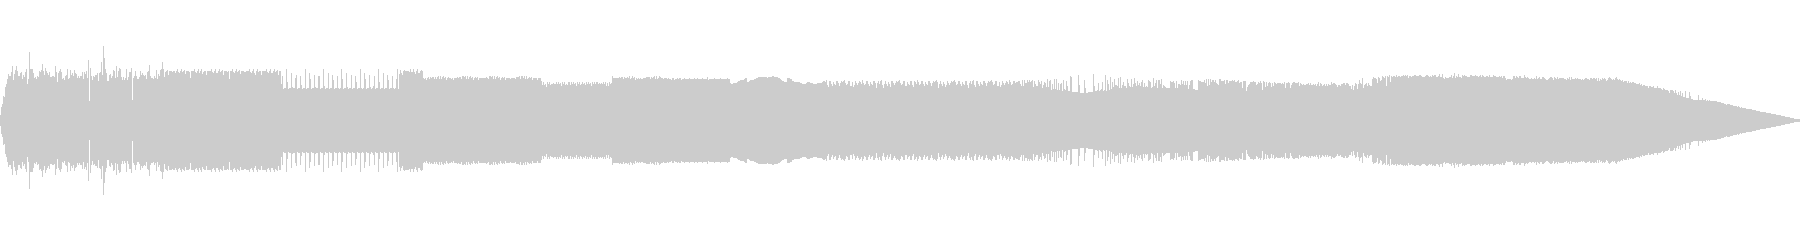 SE エッジの効いた電子音の未再生の波形